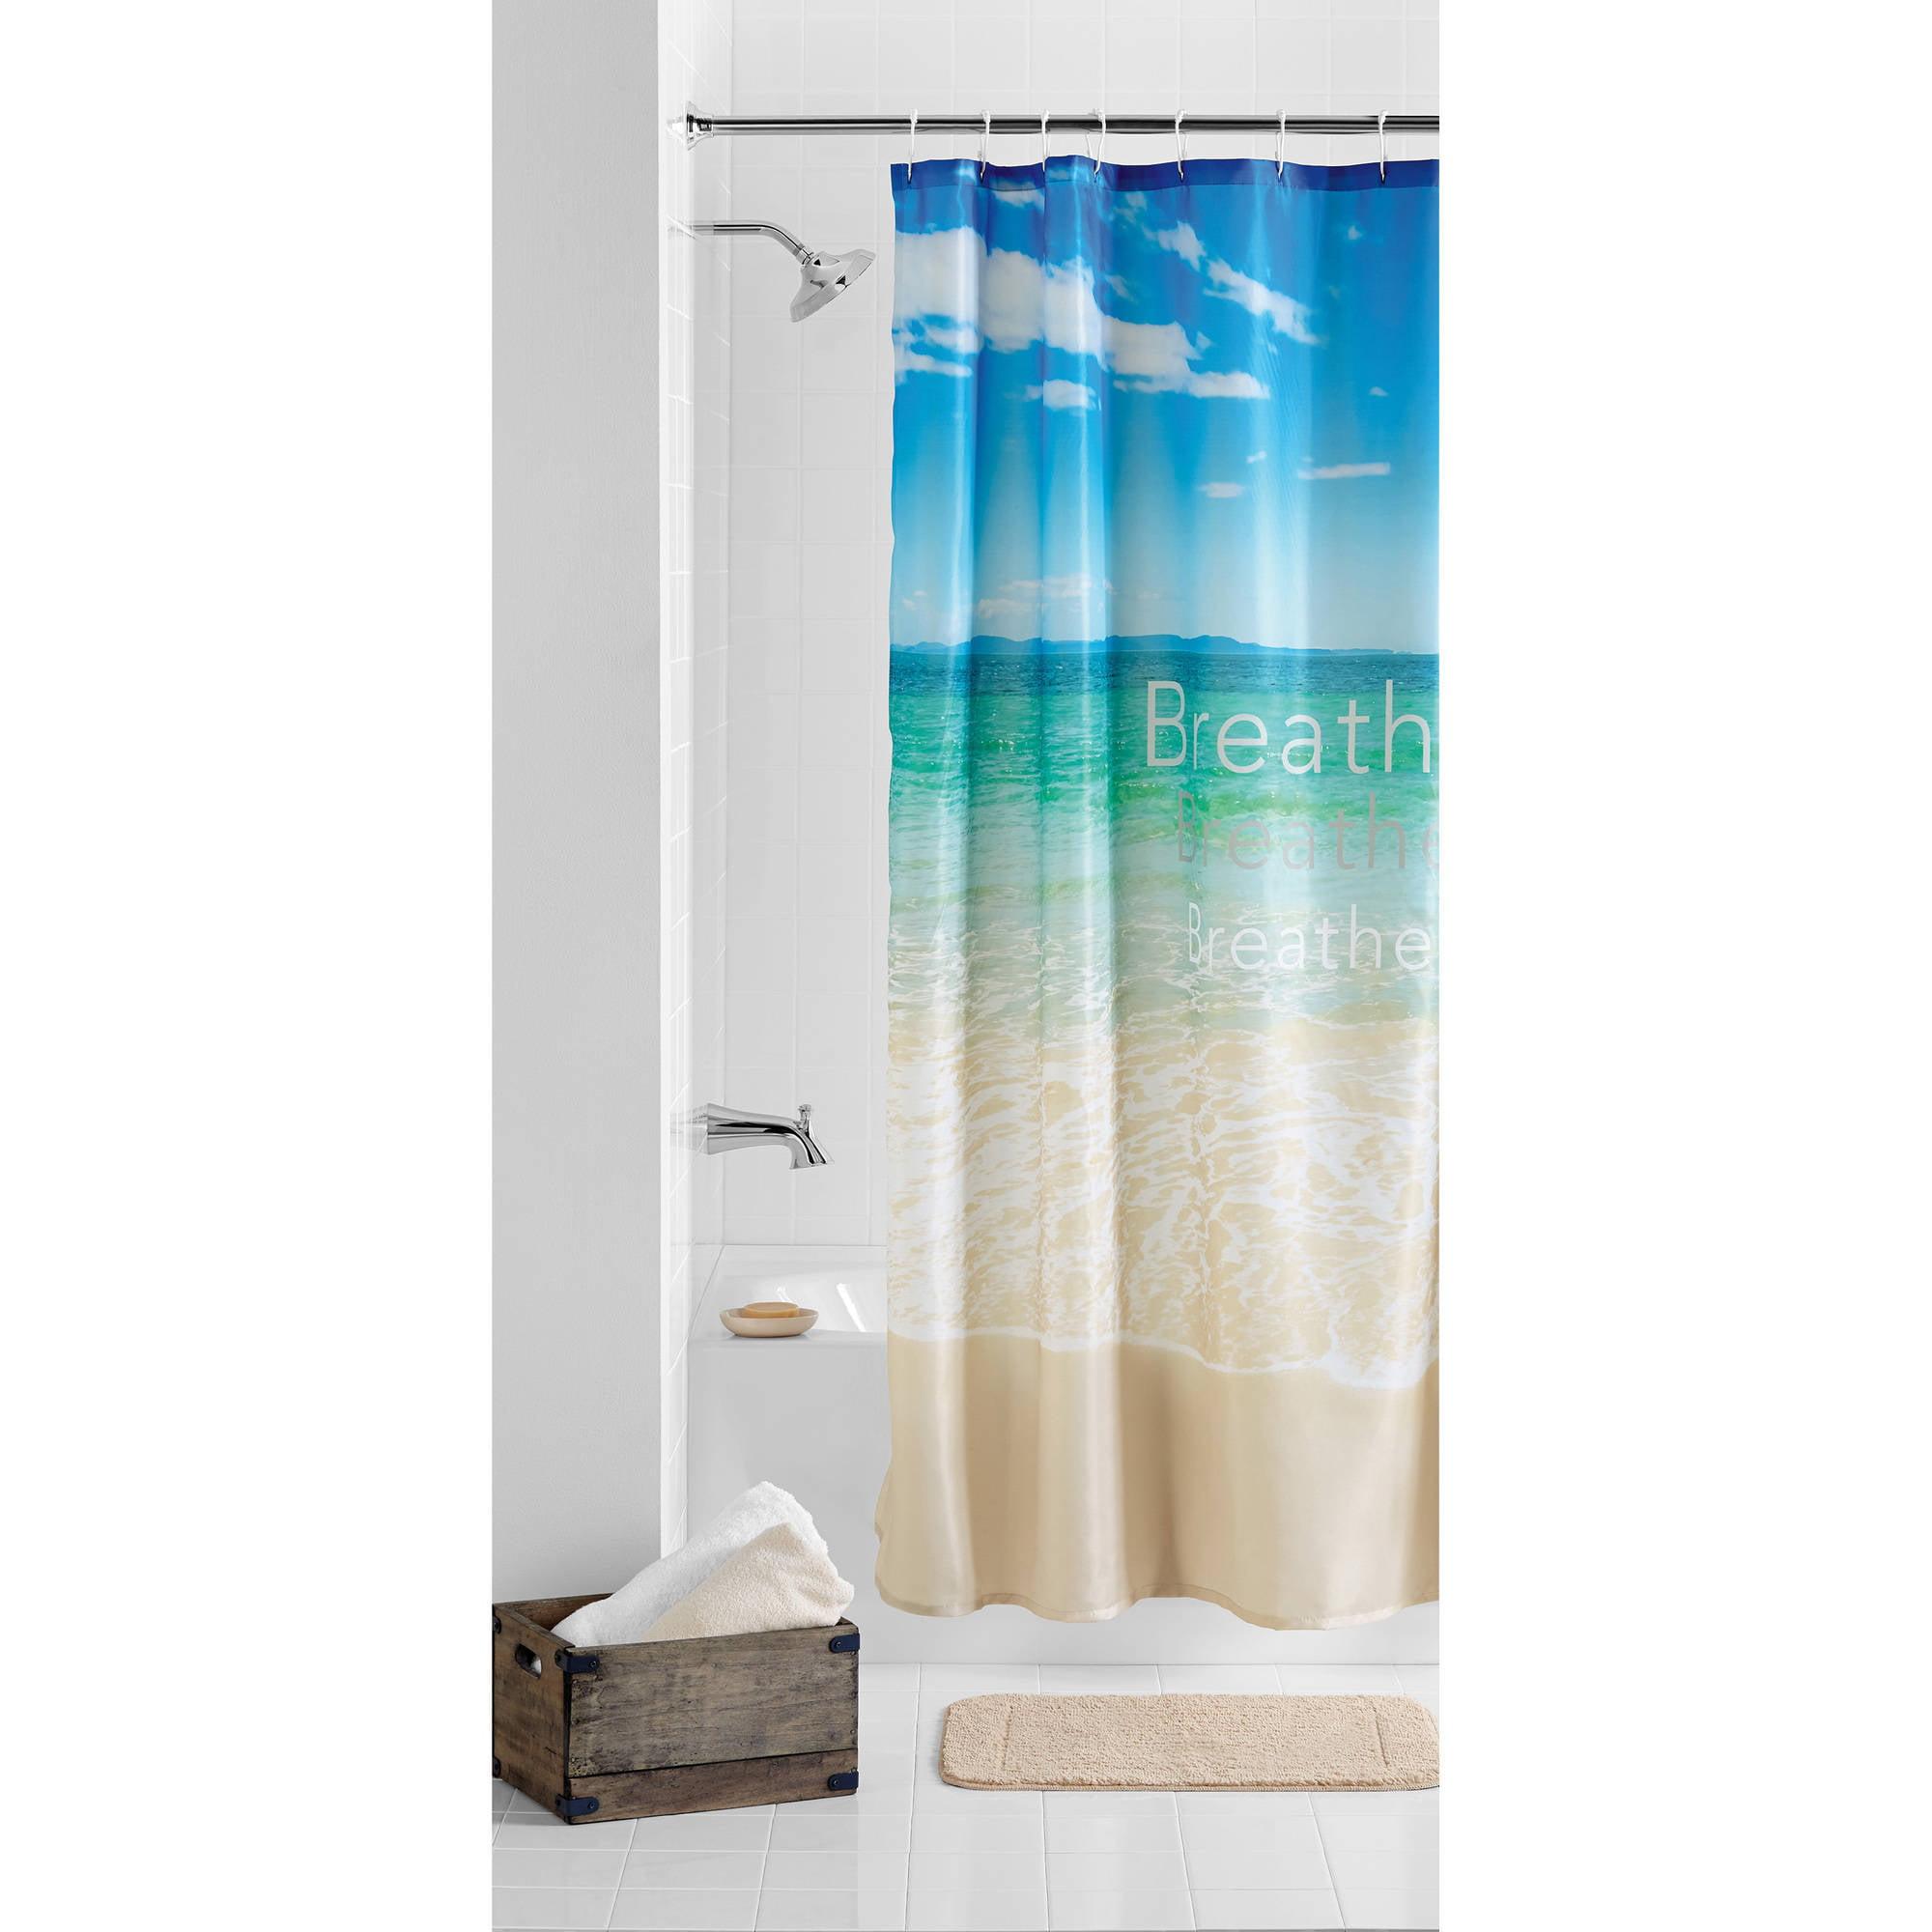 mainstays breath fabric shower curtain - walmart